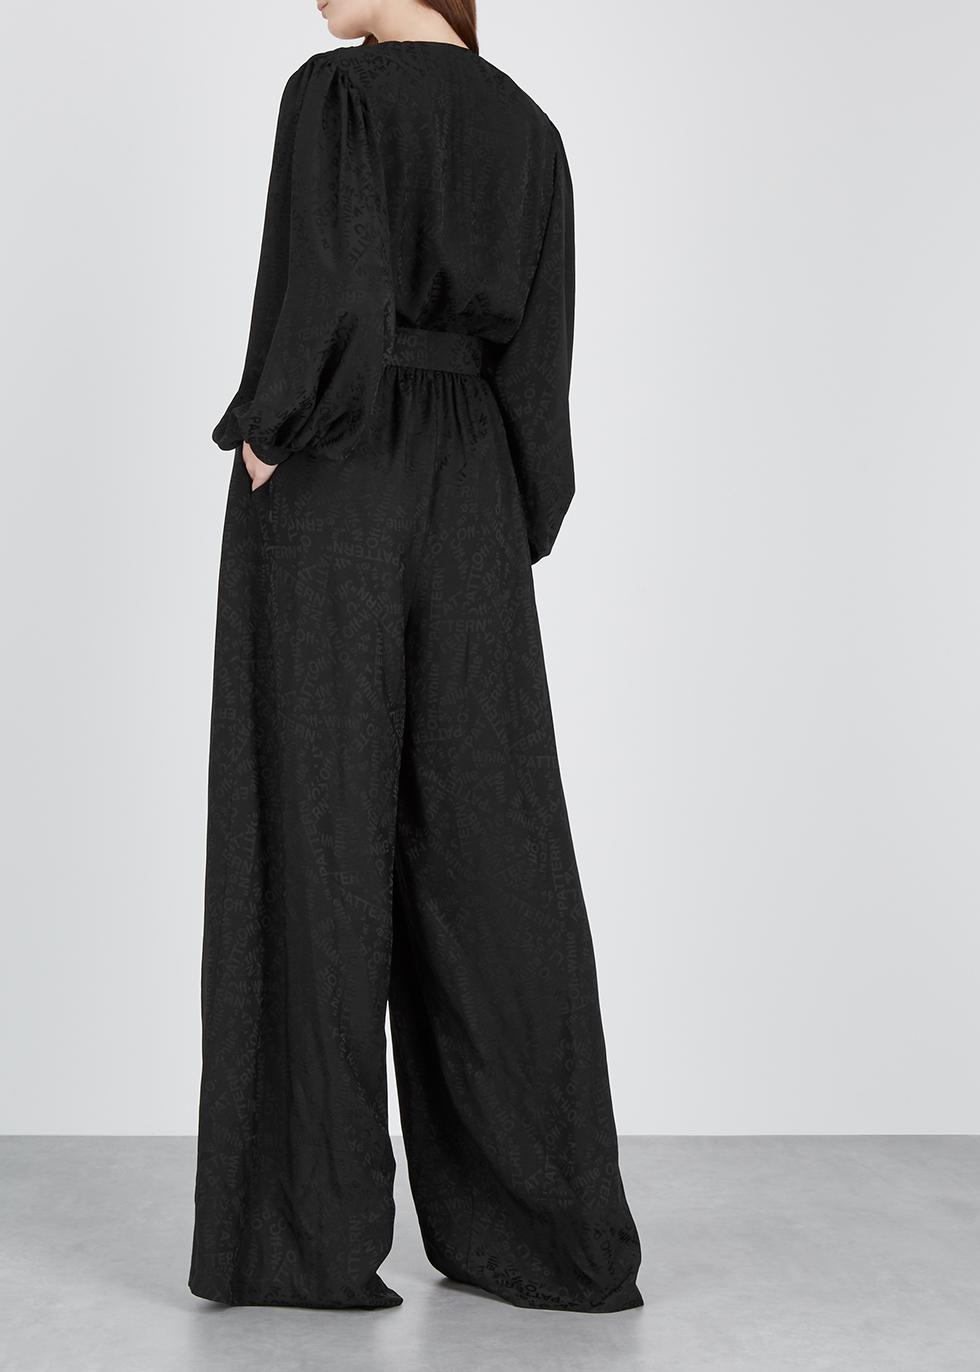 Black belted jacquard jumpsuit - Off-White